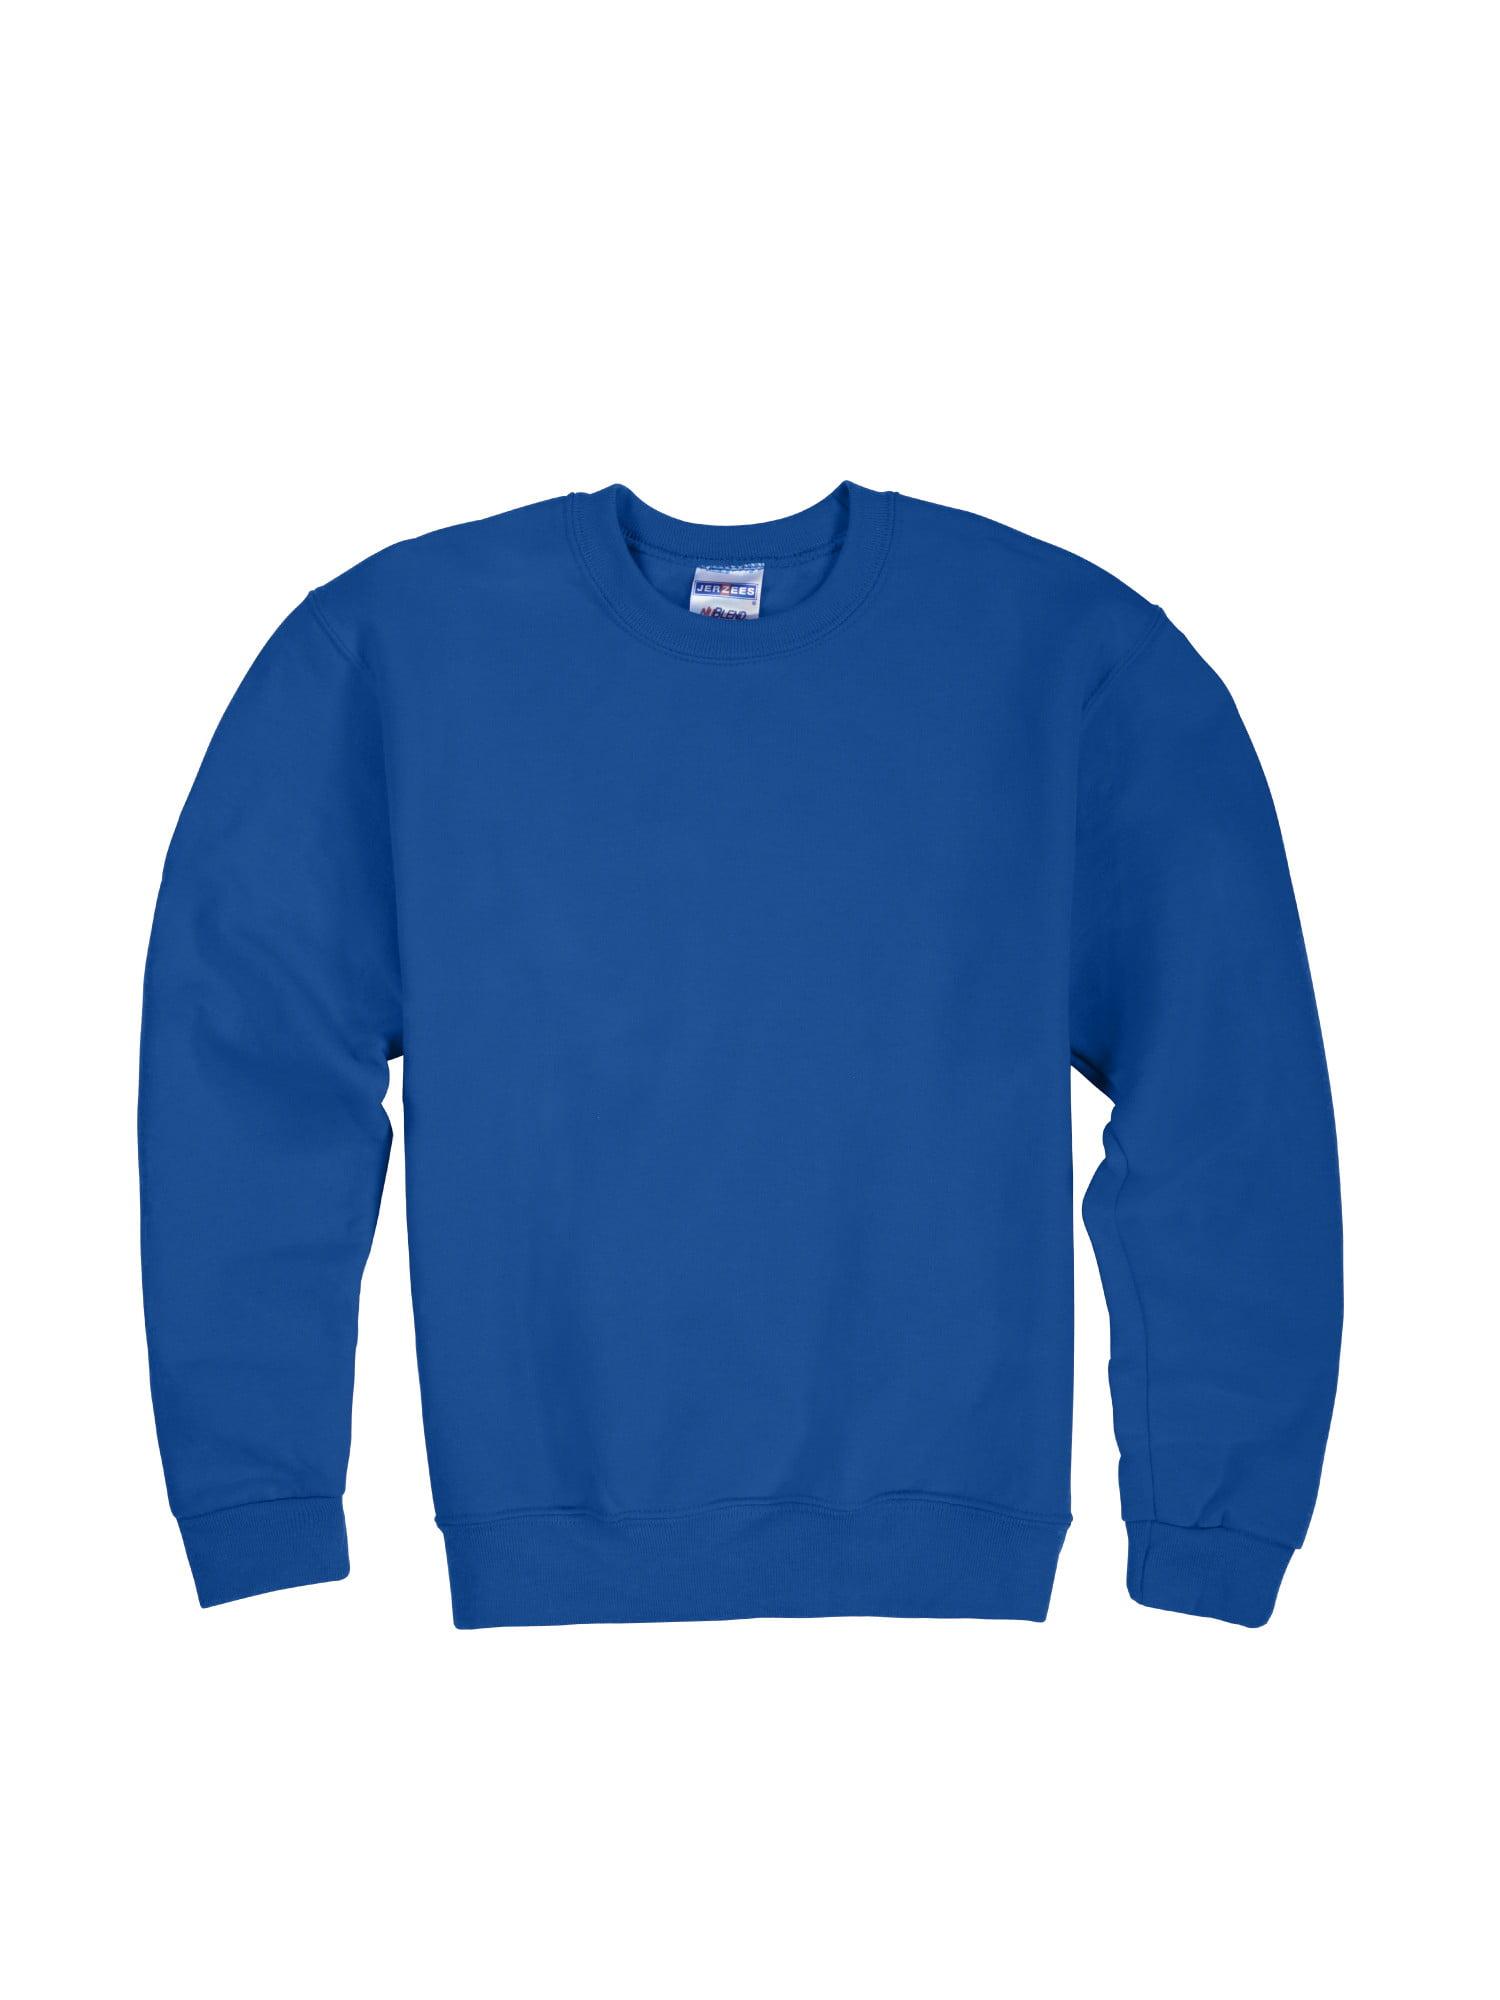 Mens Jerzees Red FLEECE Jacket Coat xxl 2xl Long sleeves warm was £4.99 NOW £4